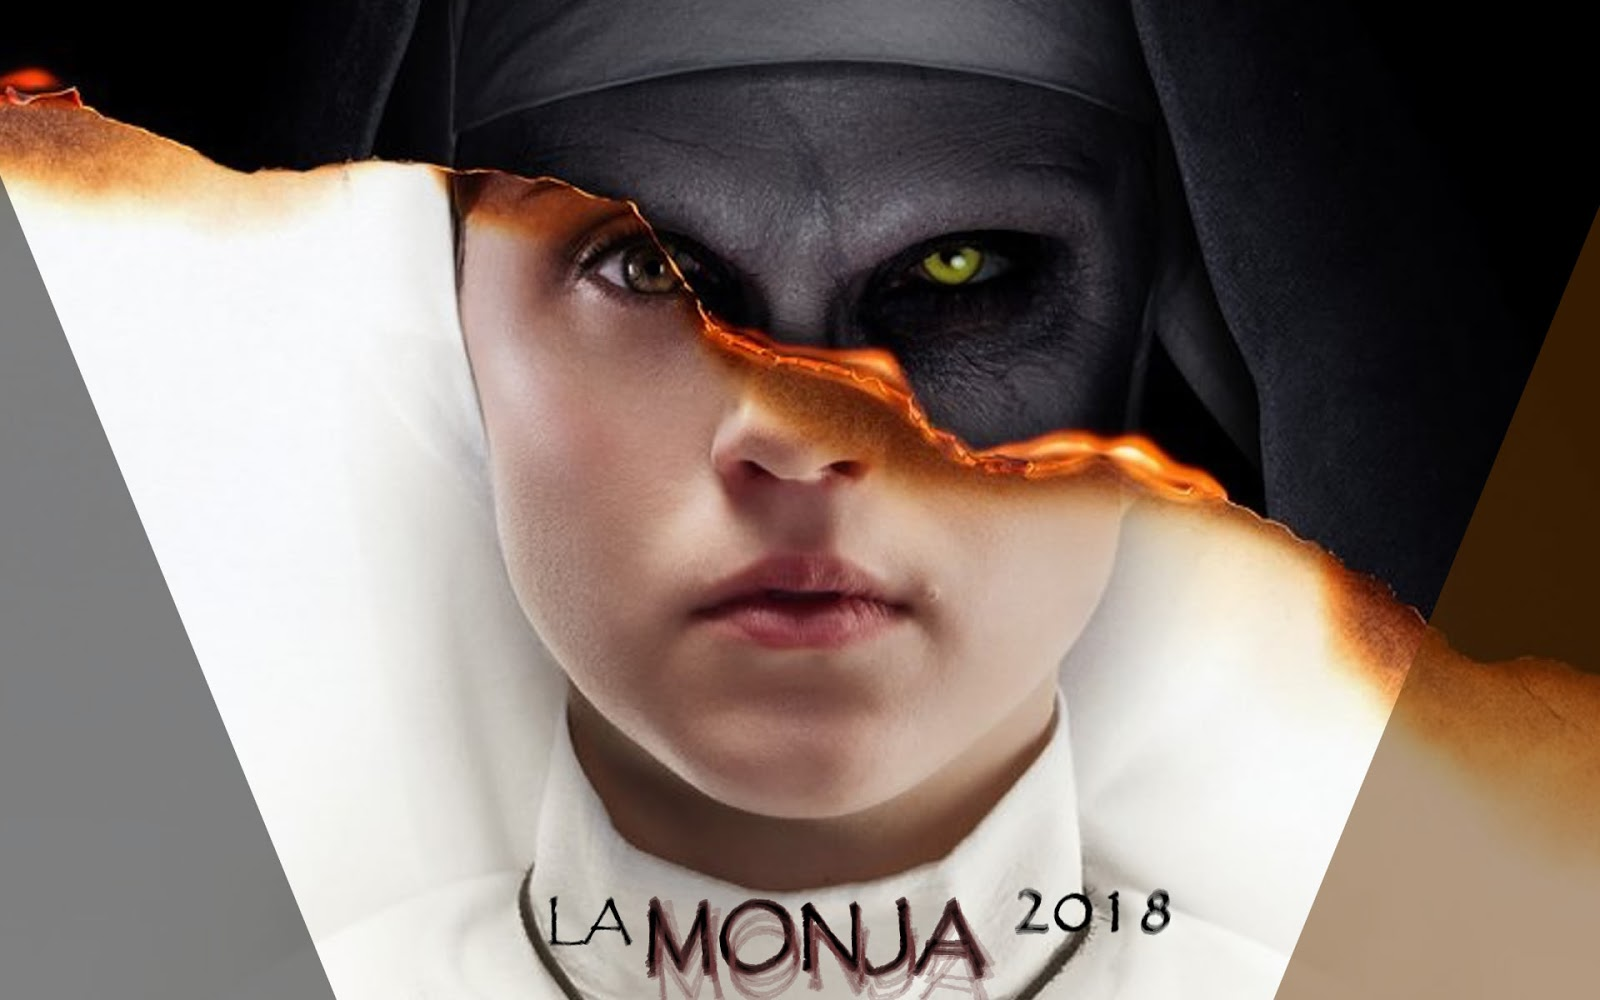 Ver La Monja Pelicula 2018 Español Latino Gratis Gnula